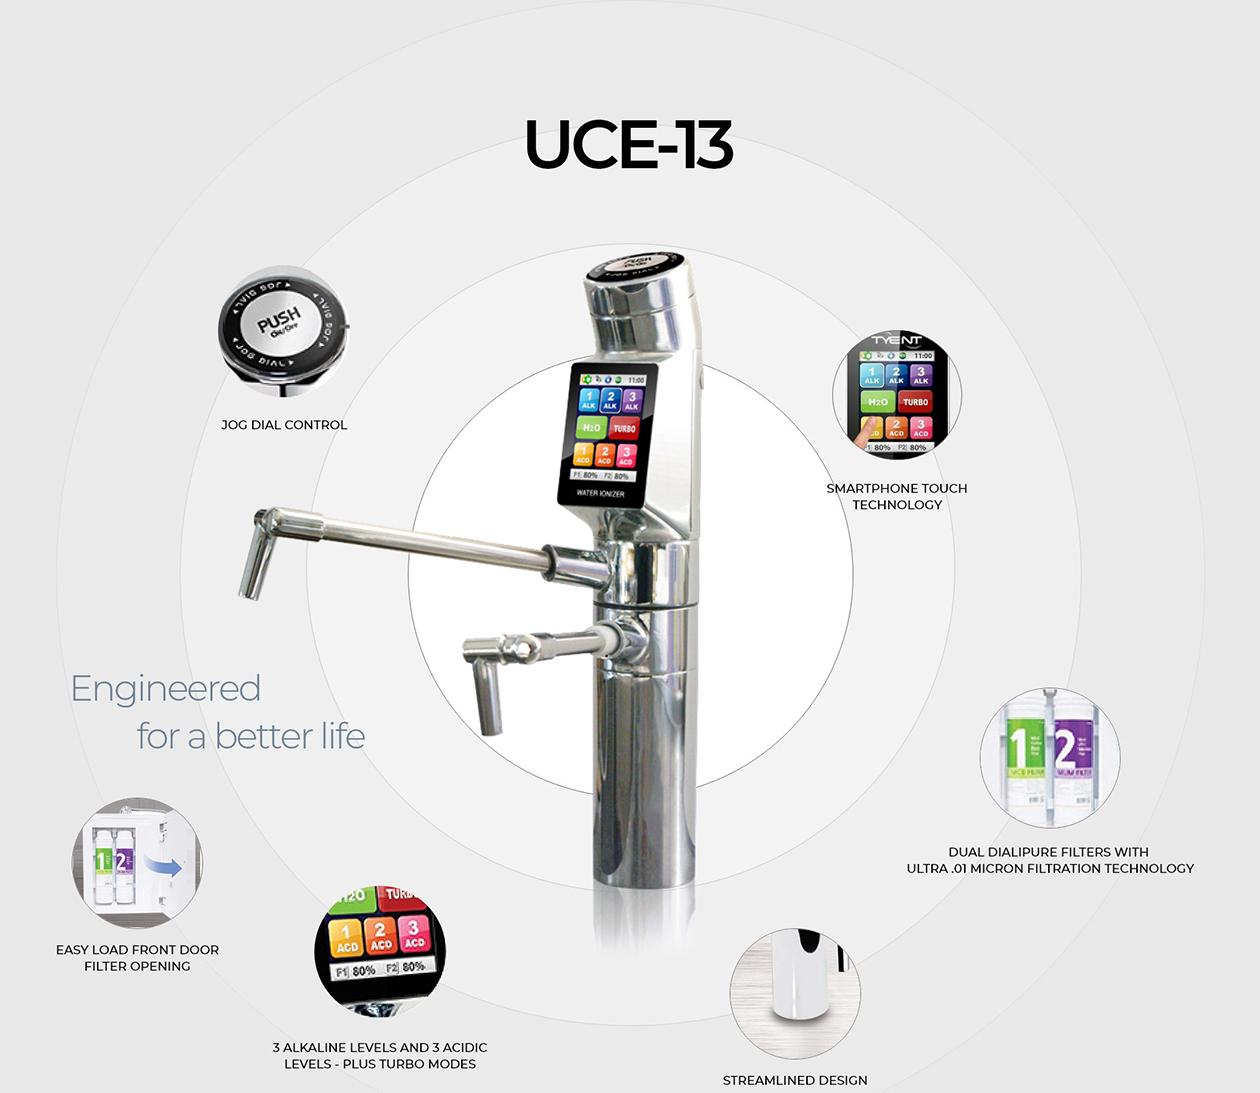 Tyent UCE-13 Unrivaled Technology